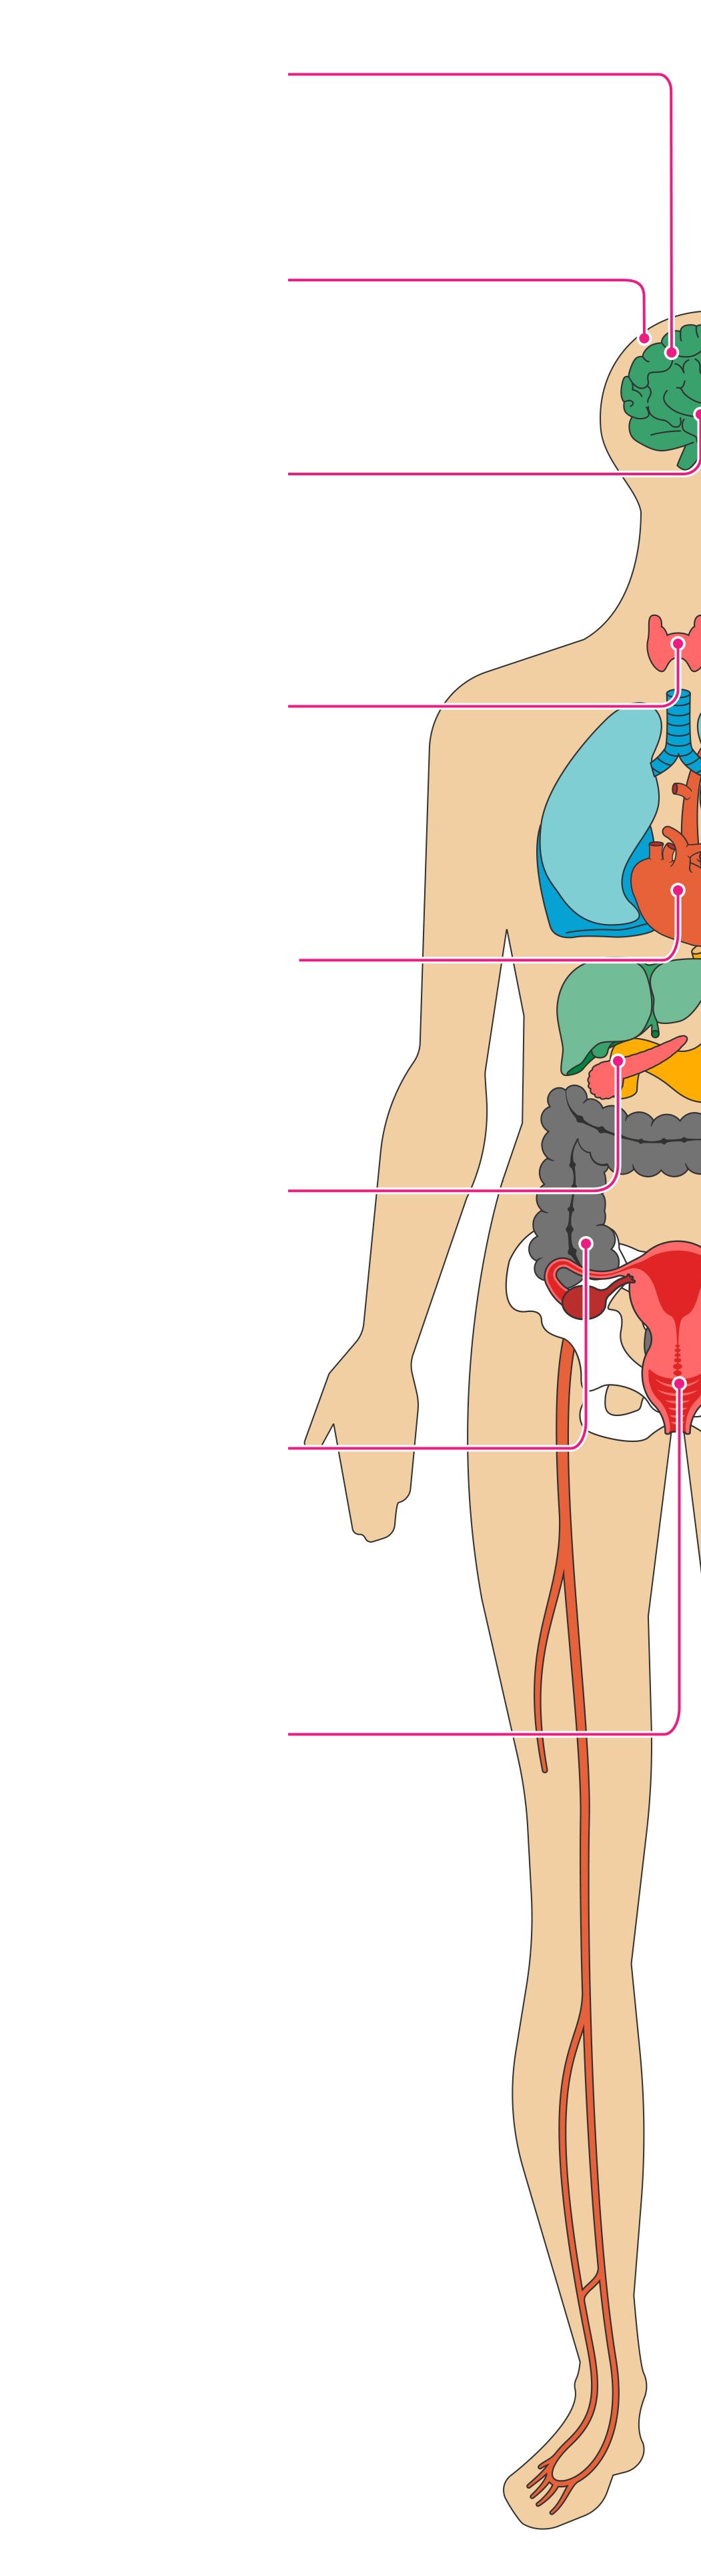 prevalent hashimoto's symptoms